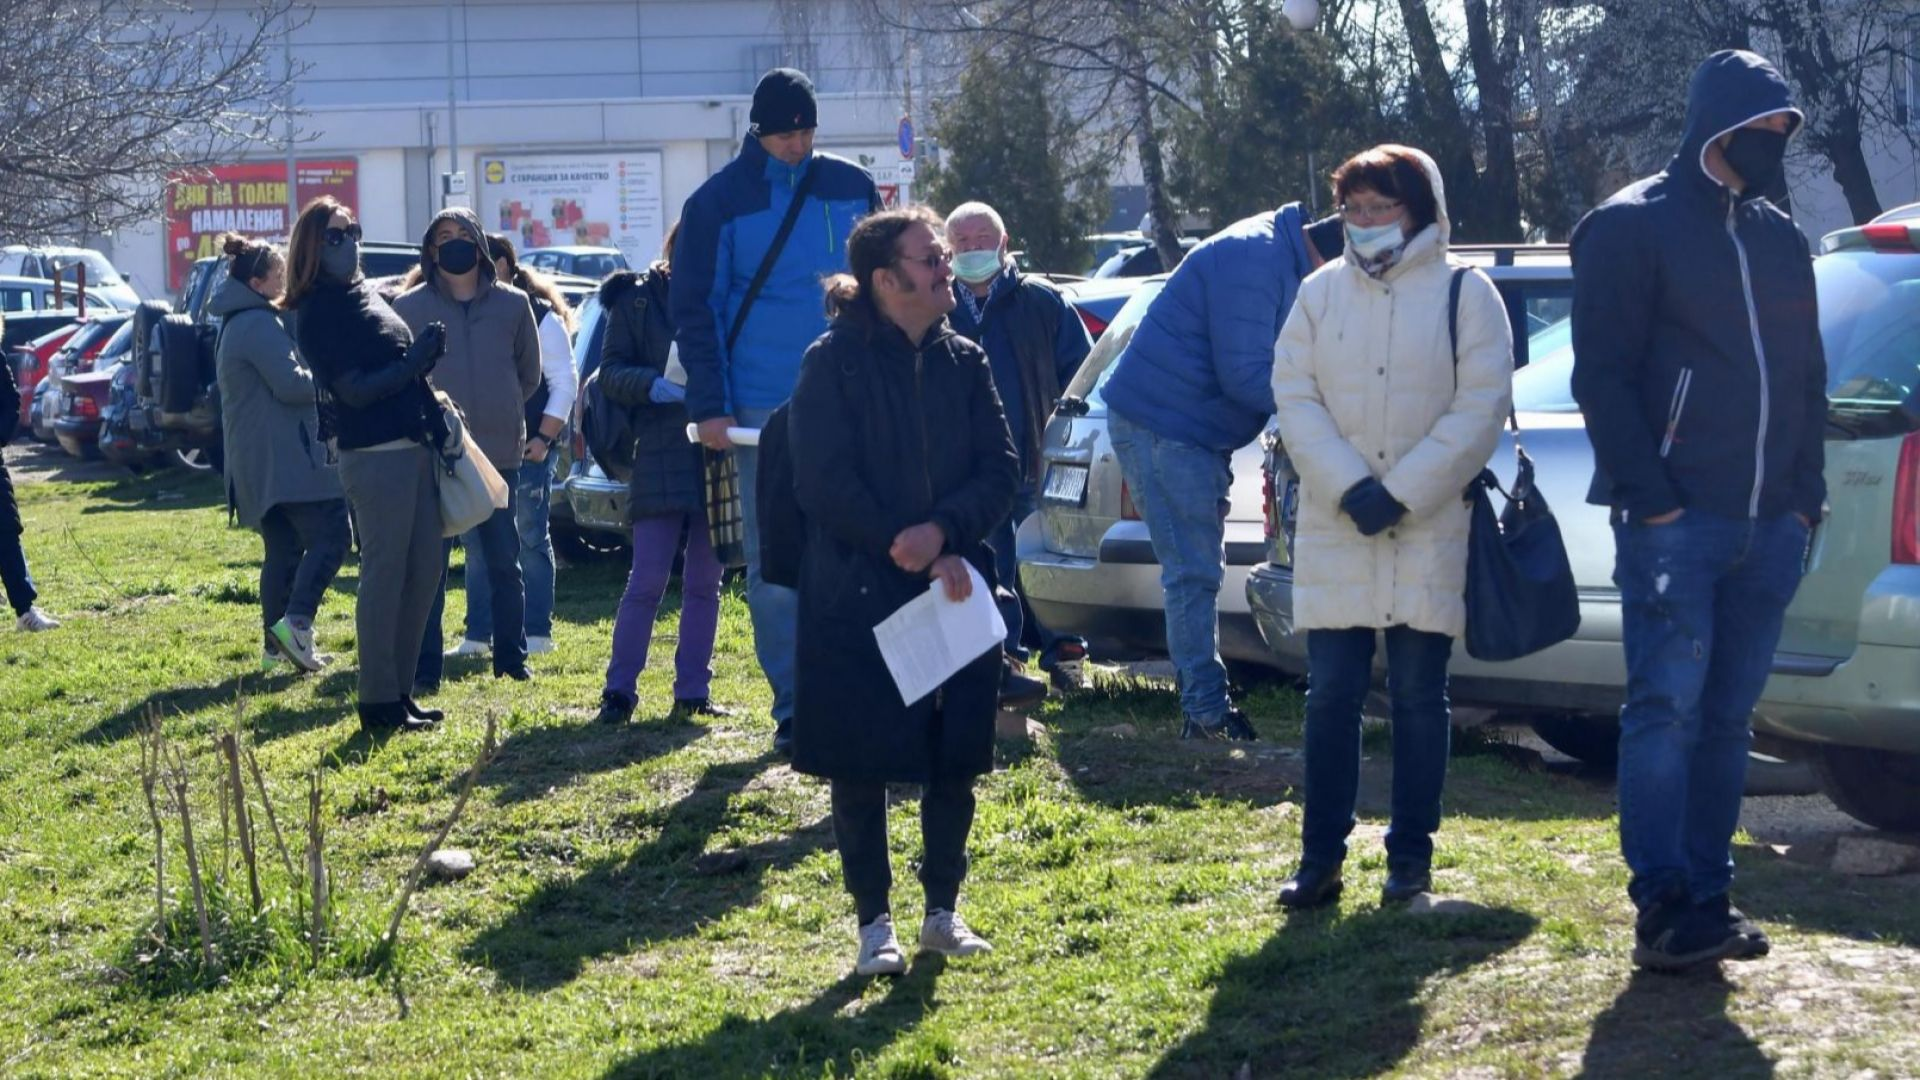 1,6 млн. българи под прага на бедността, 17% от децата не празнуват рожден ден заради безпаричие